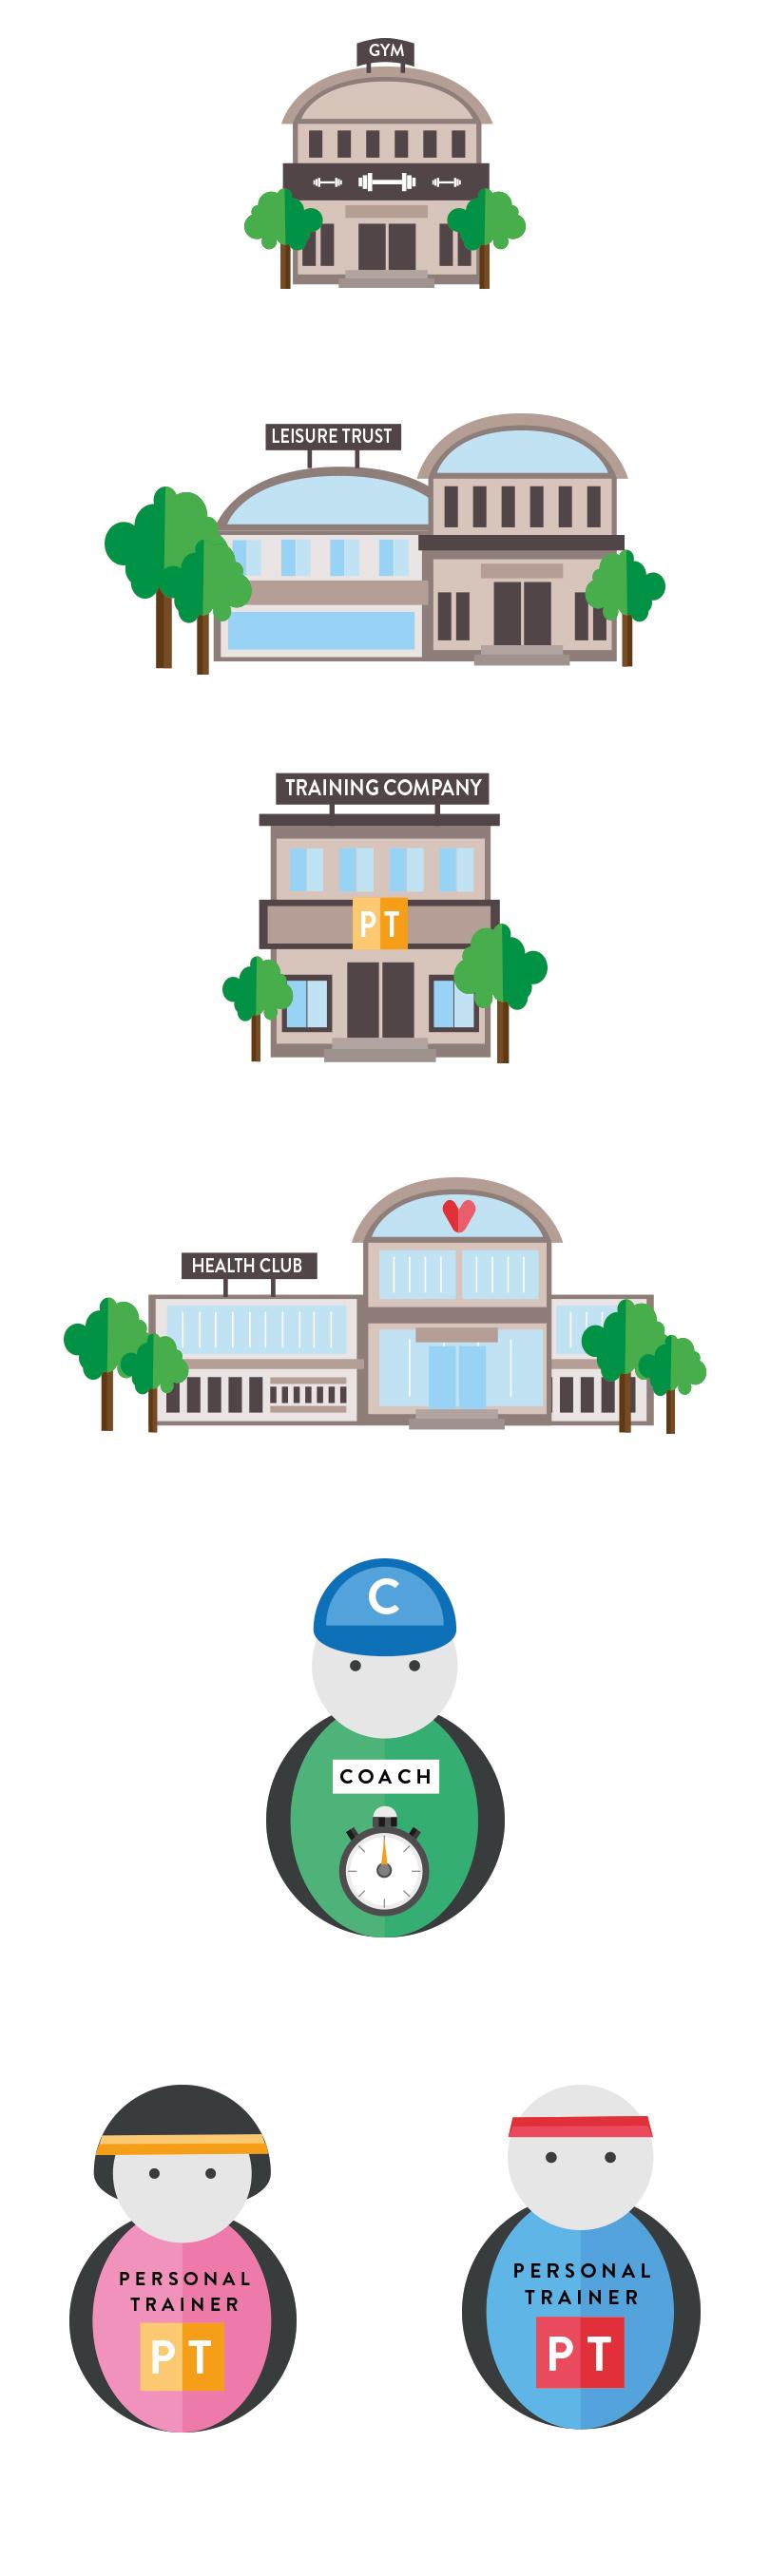 PT PLUS bespoke icons